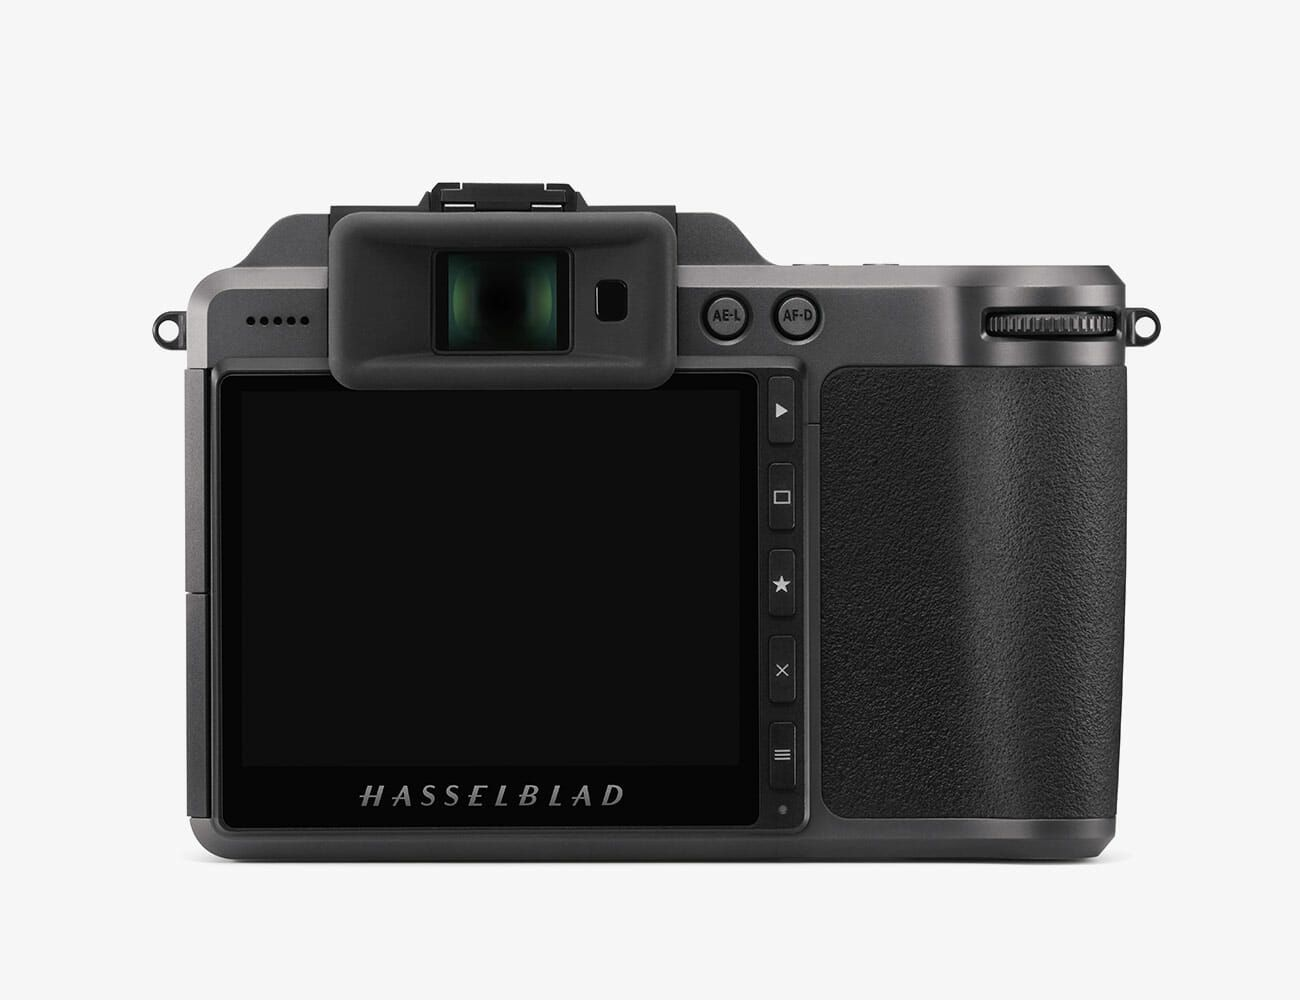 Hasselblad-X1DII-Gear-Patrol-Ambiance 5